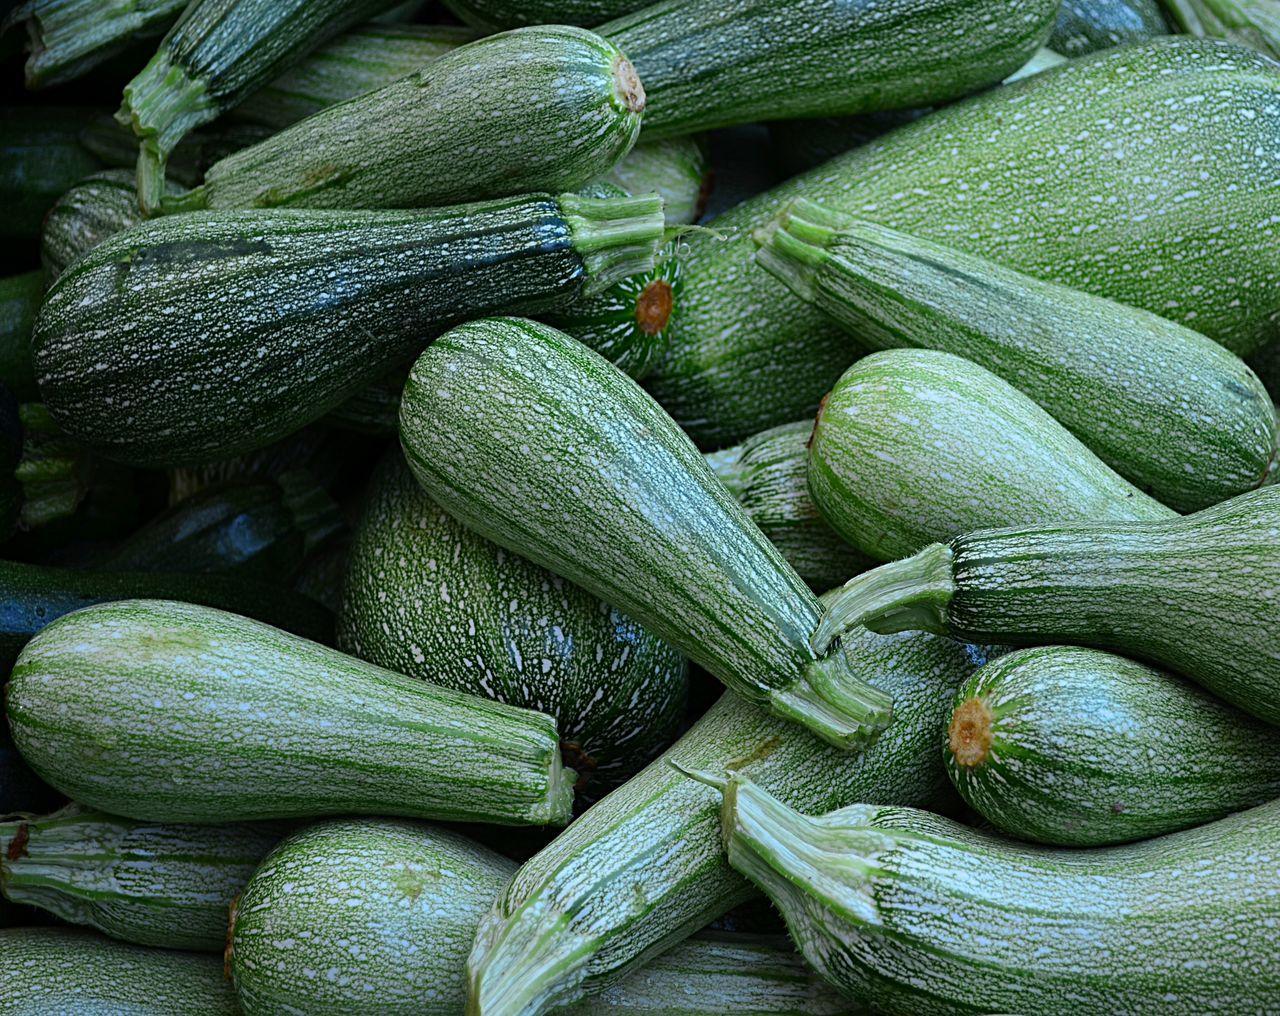 Full Frame Shot Of Fresh Zucchinis At Market Stall